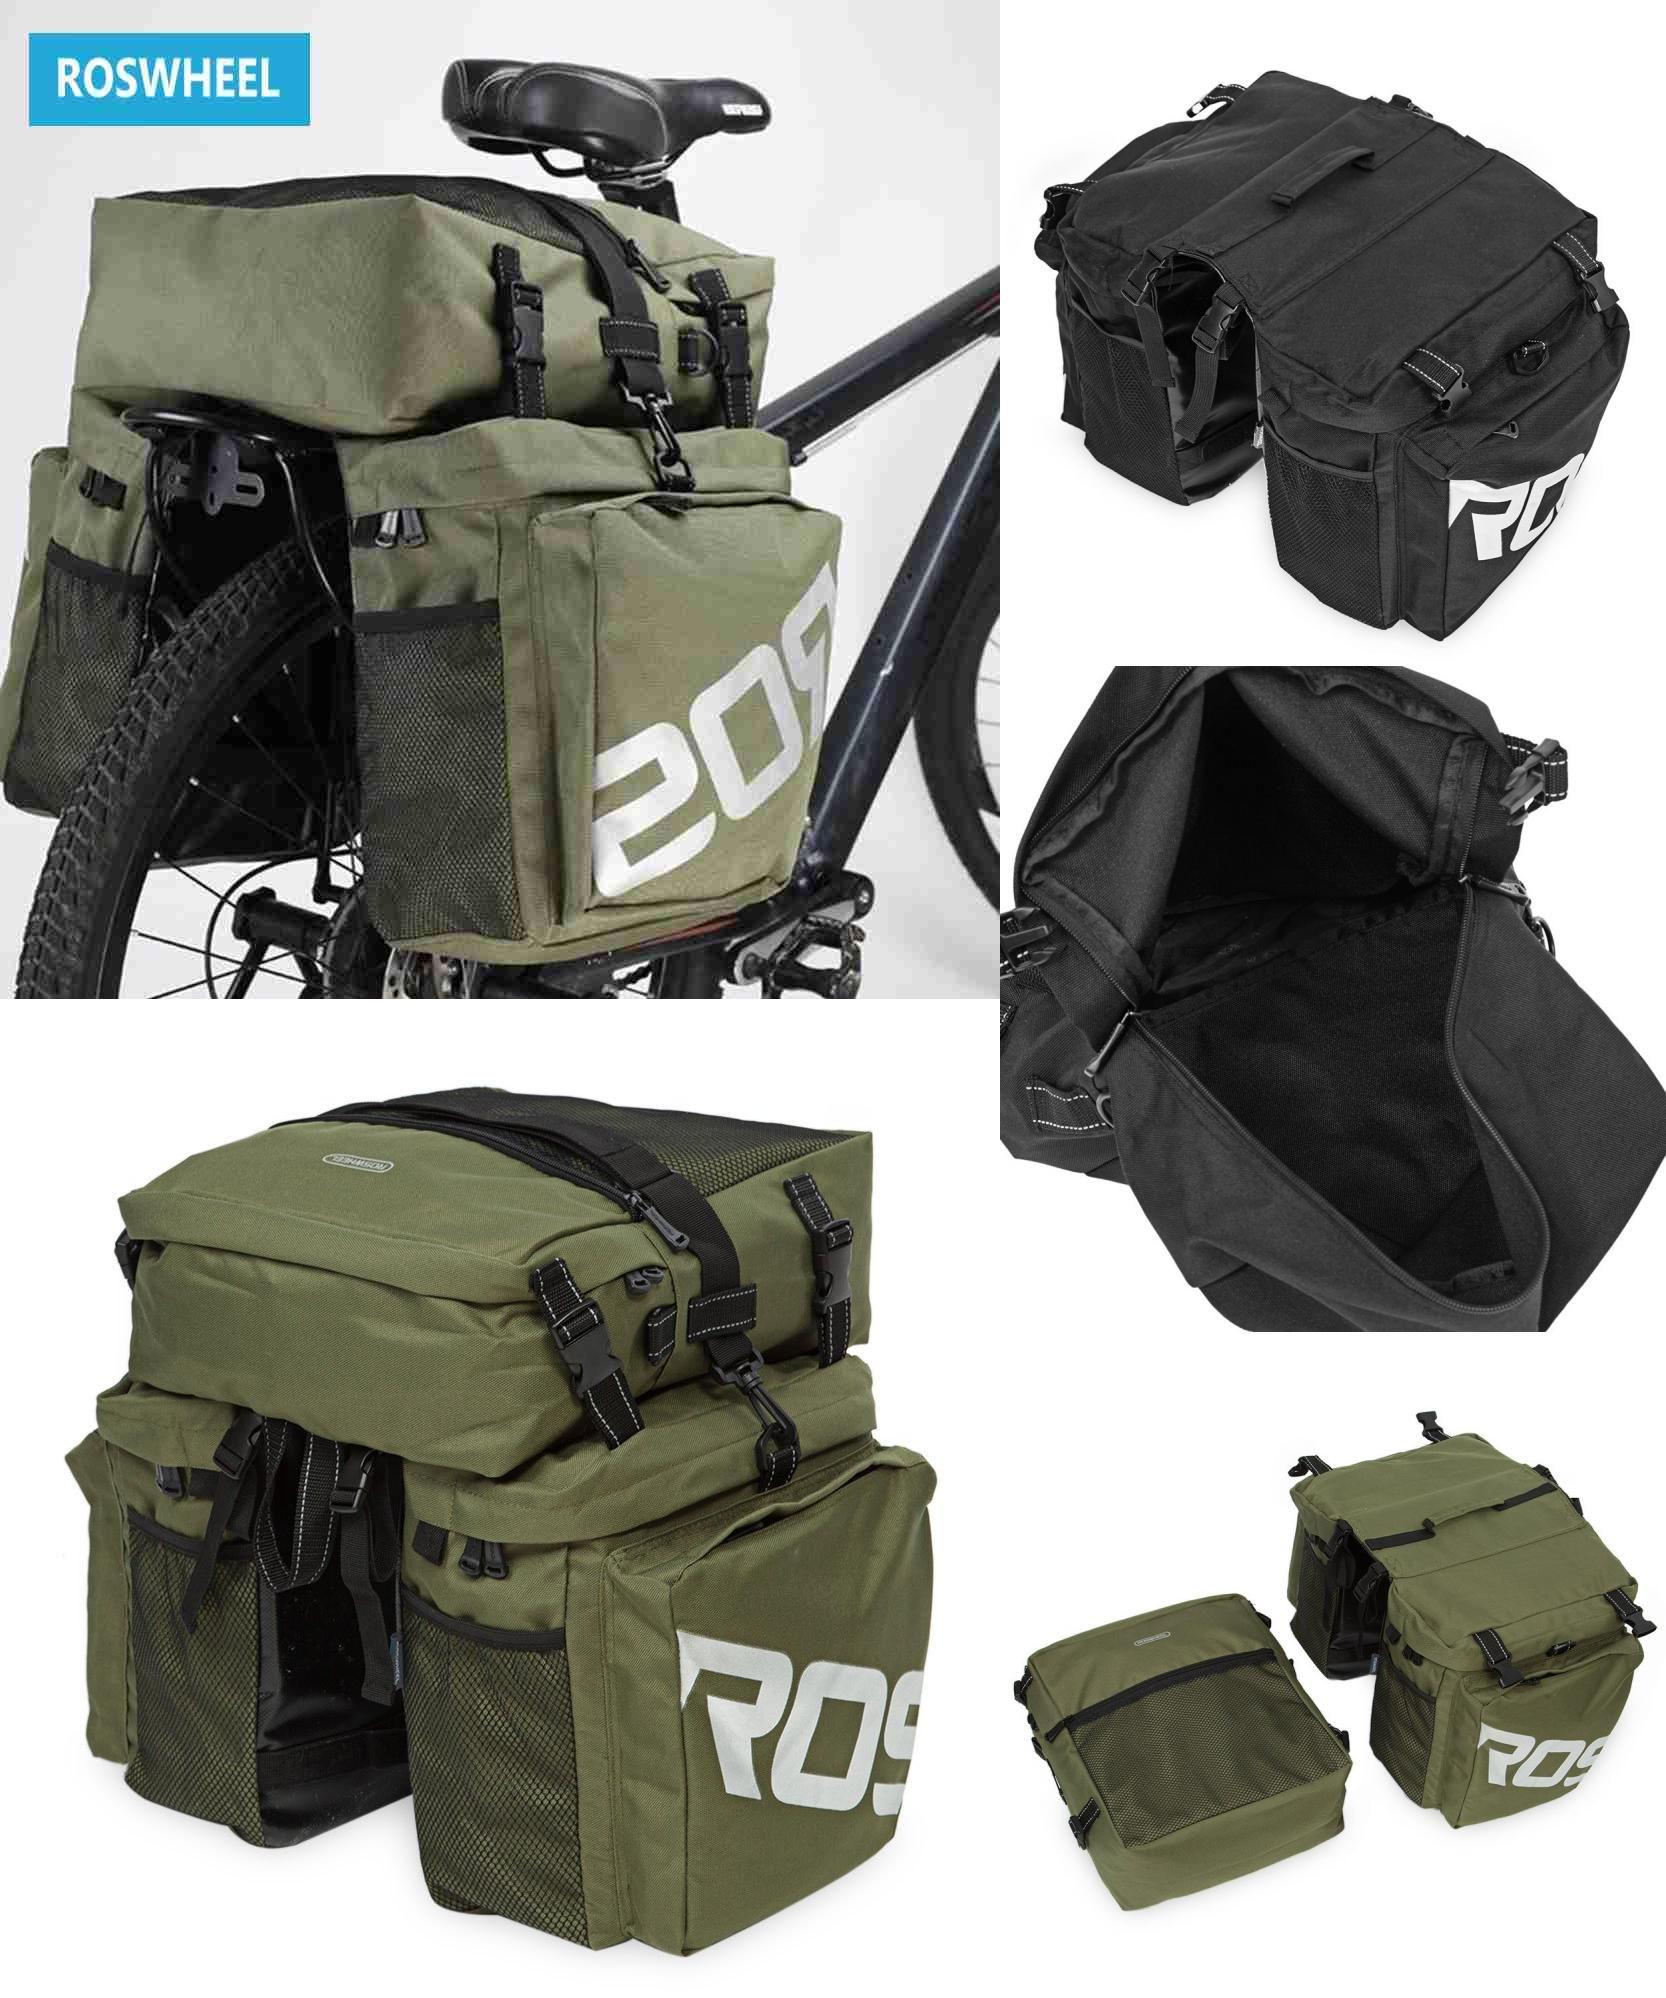 Visit To Roswheel Bike Bags 37l Mtb Mountain Rack Bag 3 In